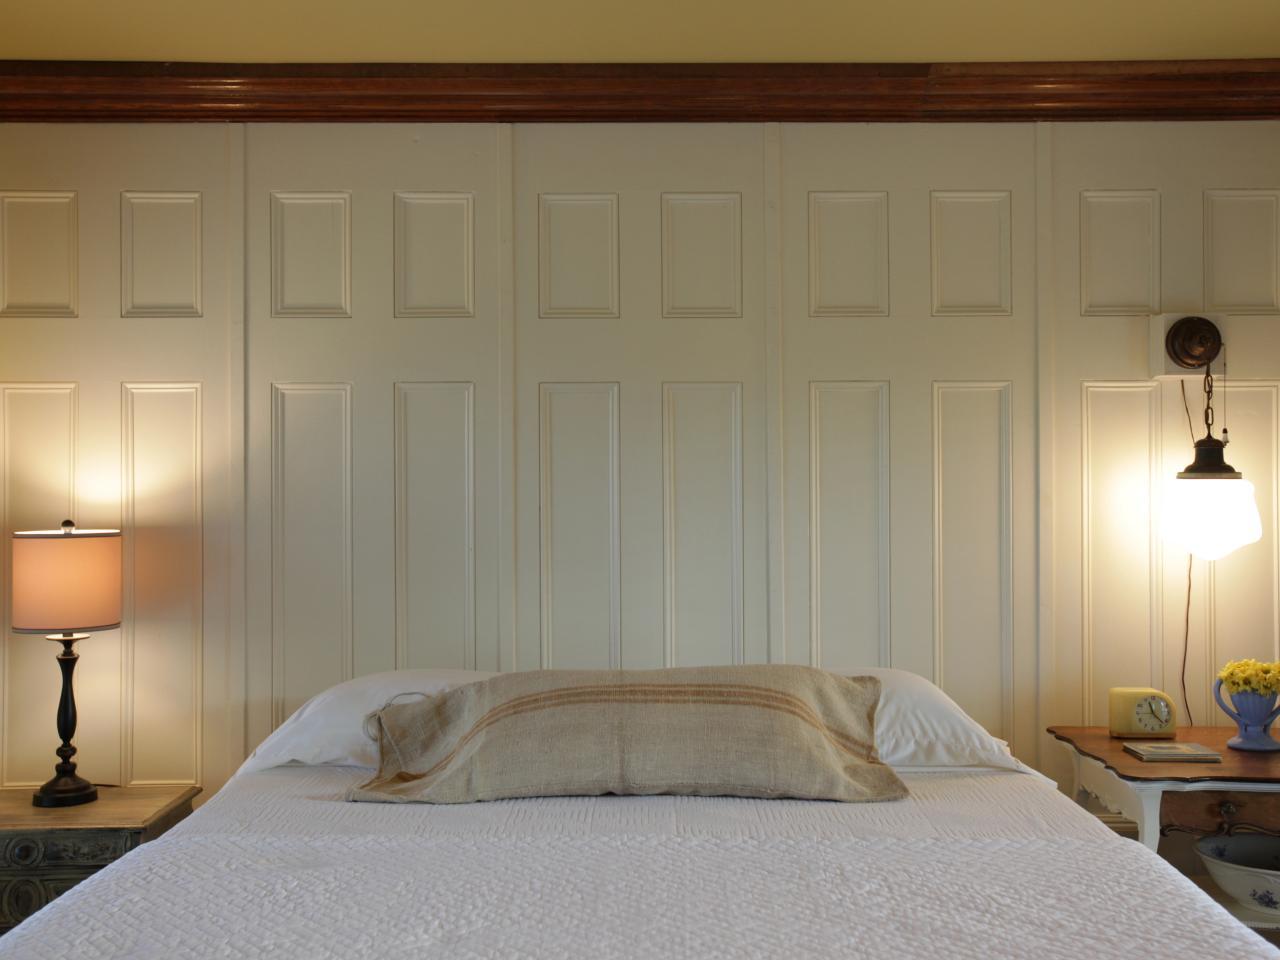 types of wood panels